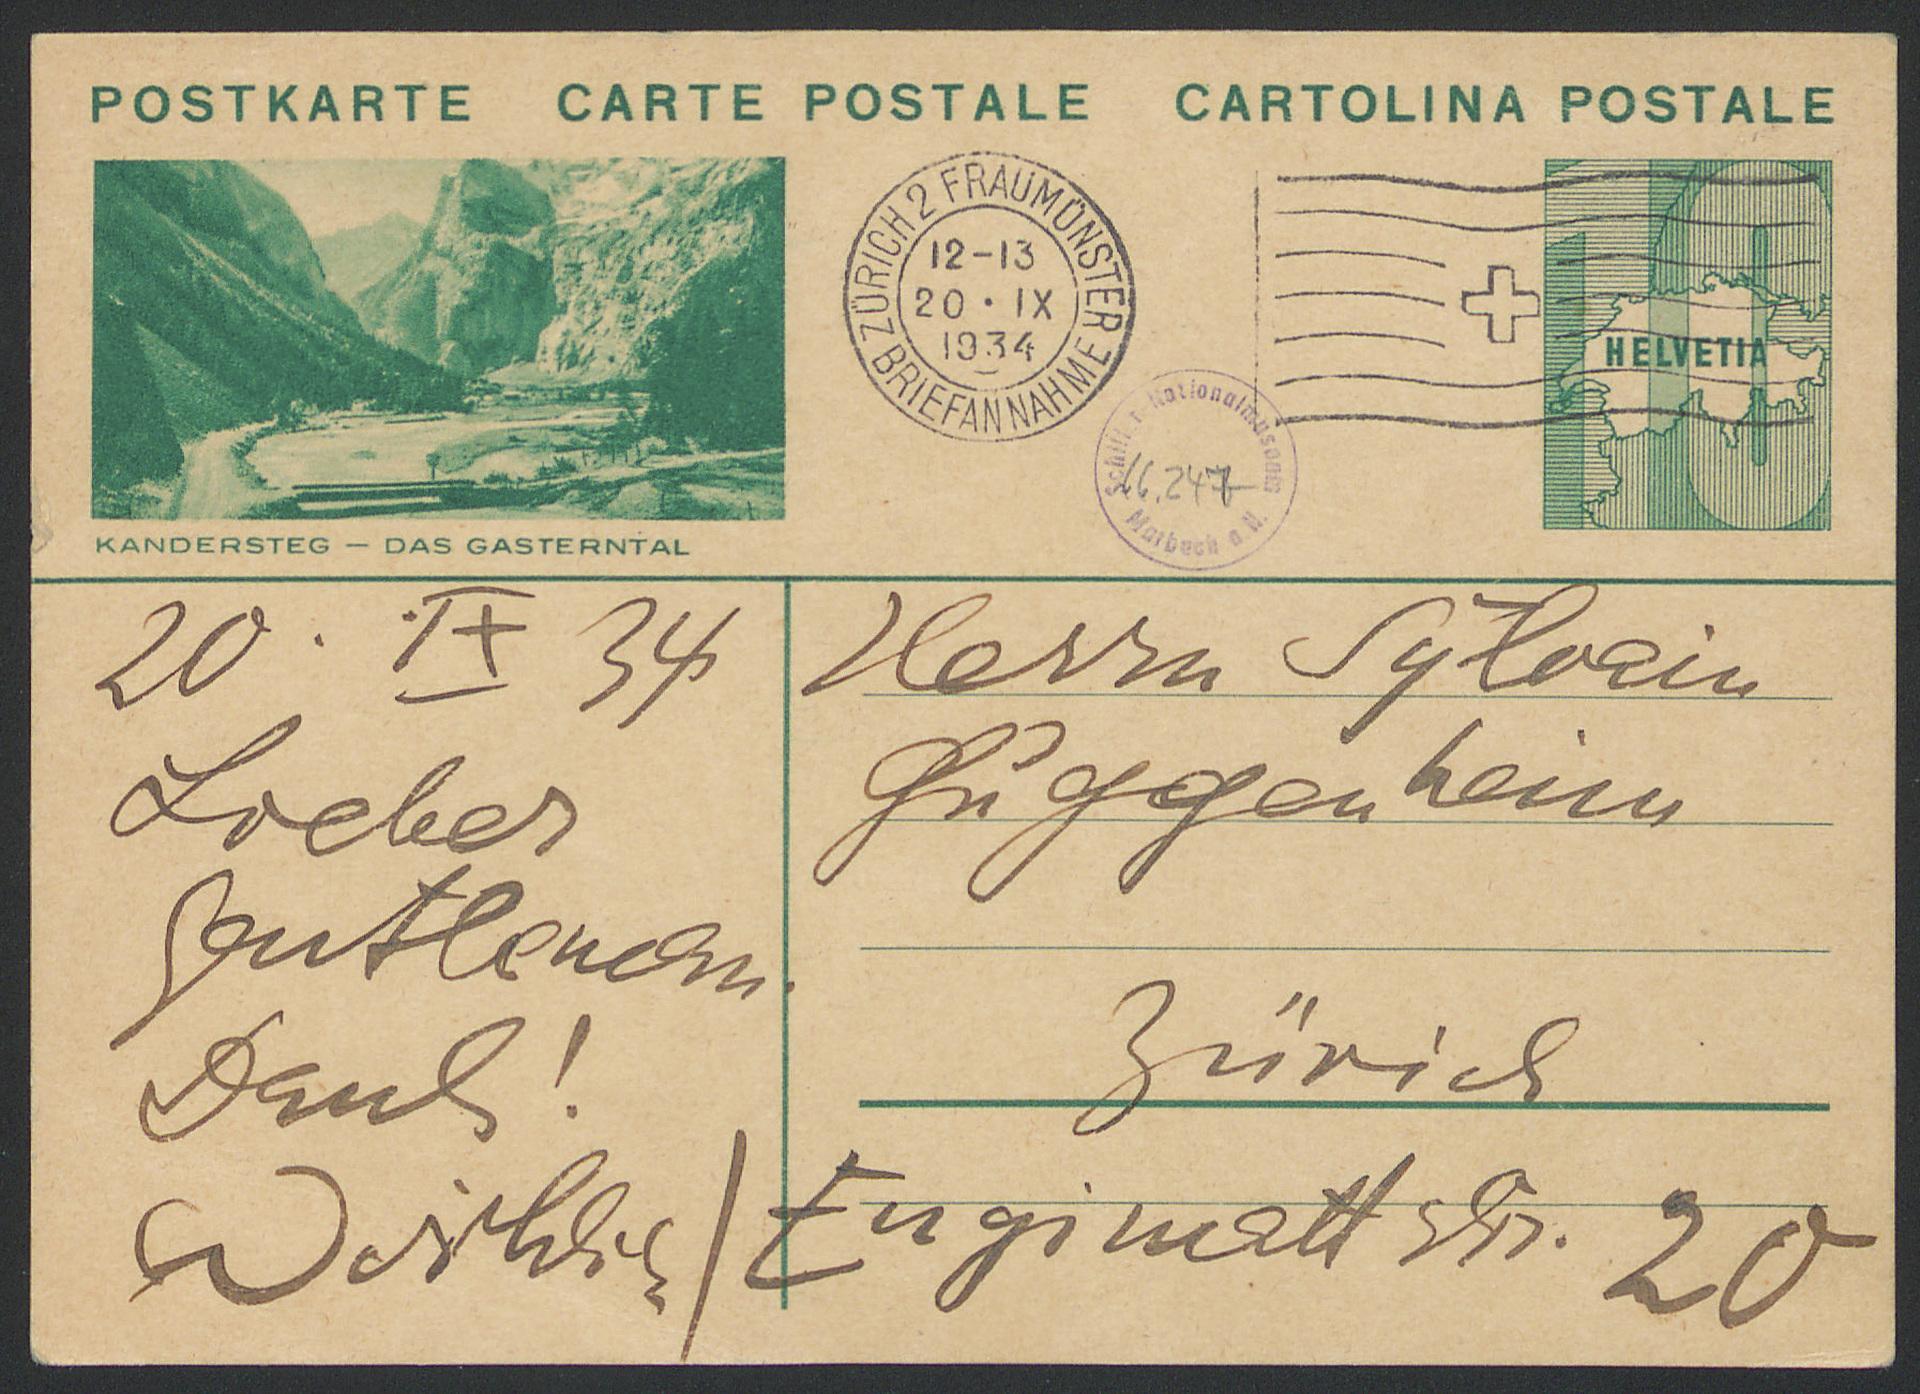 Postcard to Silvain Guggenheim